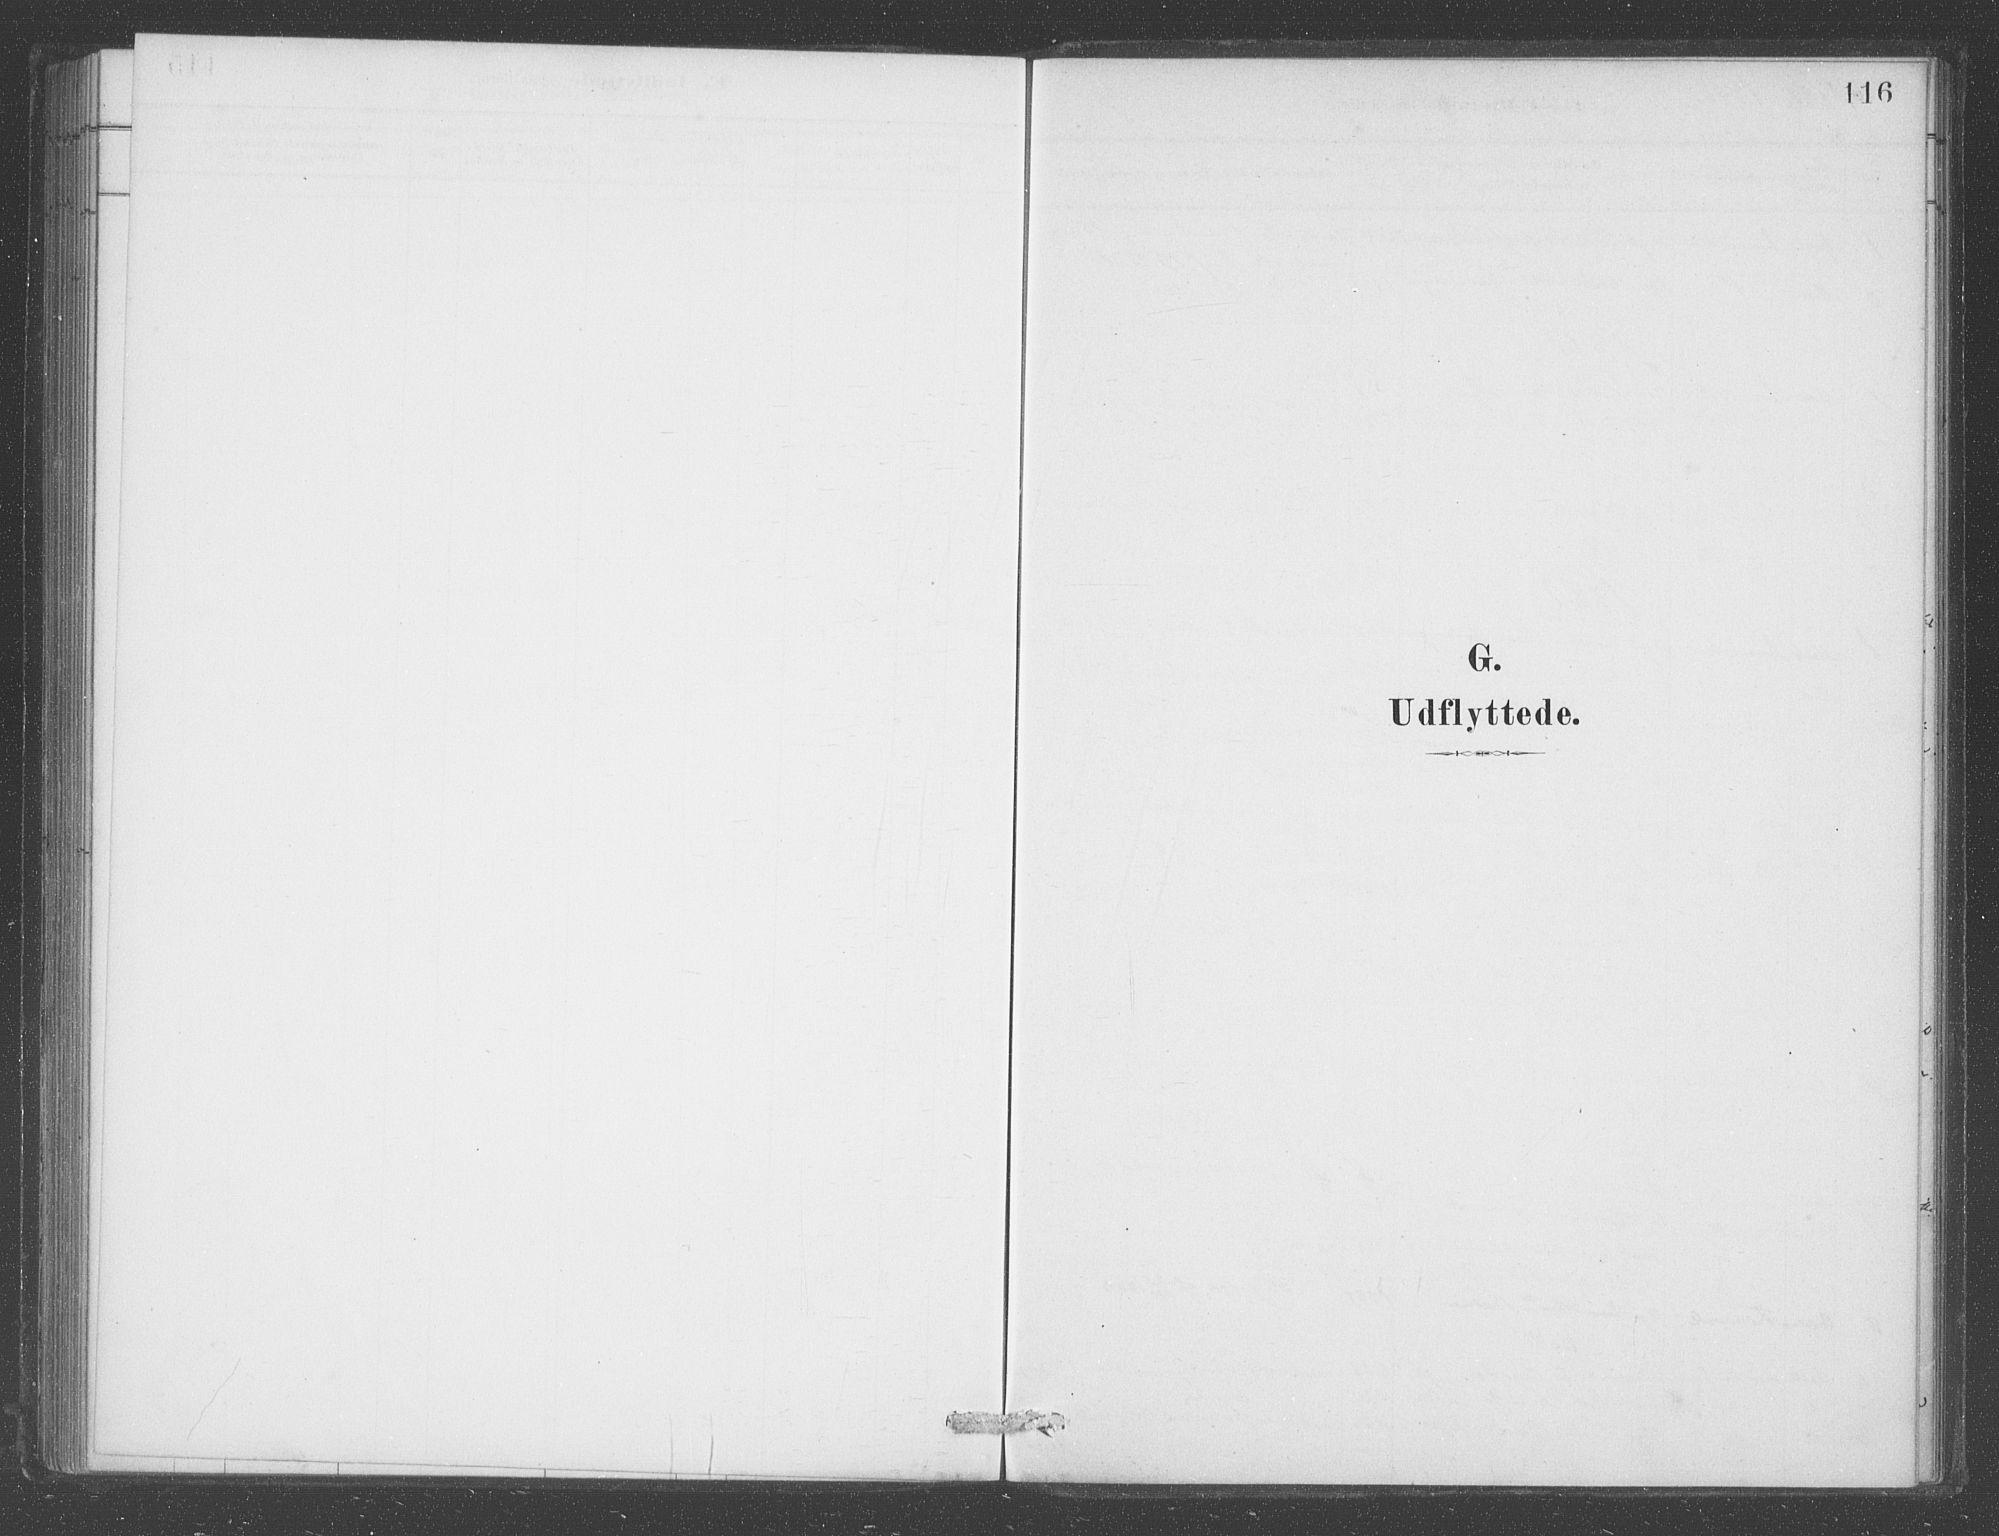 SAB, Aurland sokneprestembete, H/Ha/Had/L0001: Ministerialbok nr. D  1, 1880-1903, s. 116